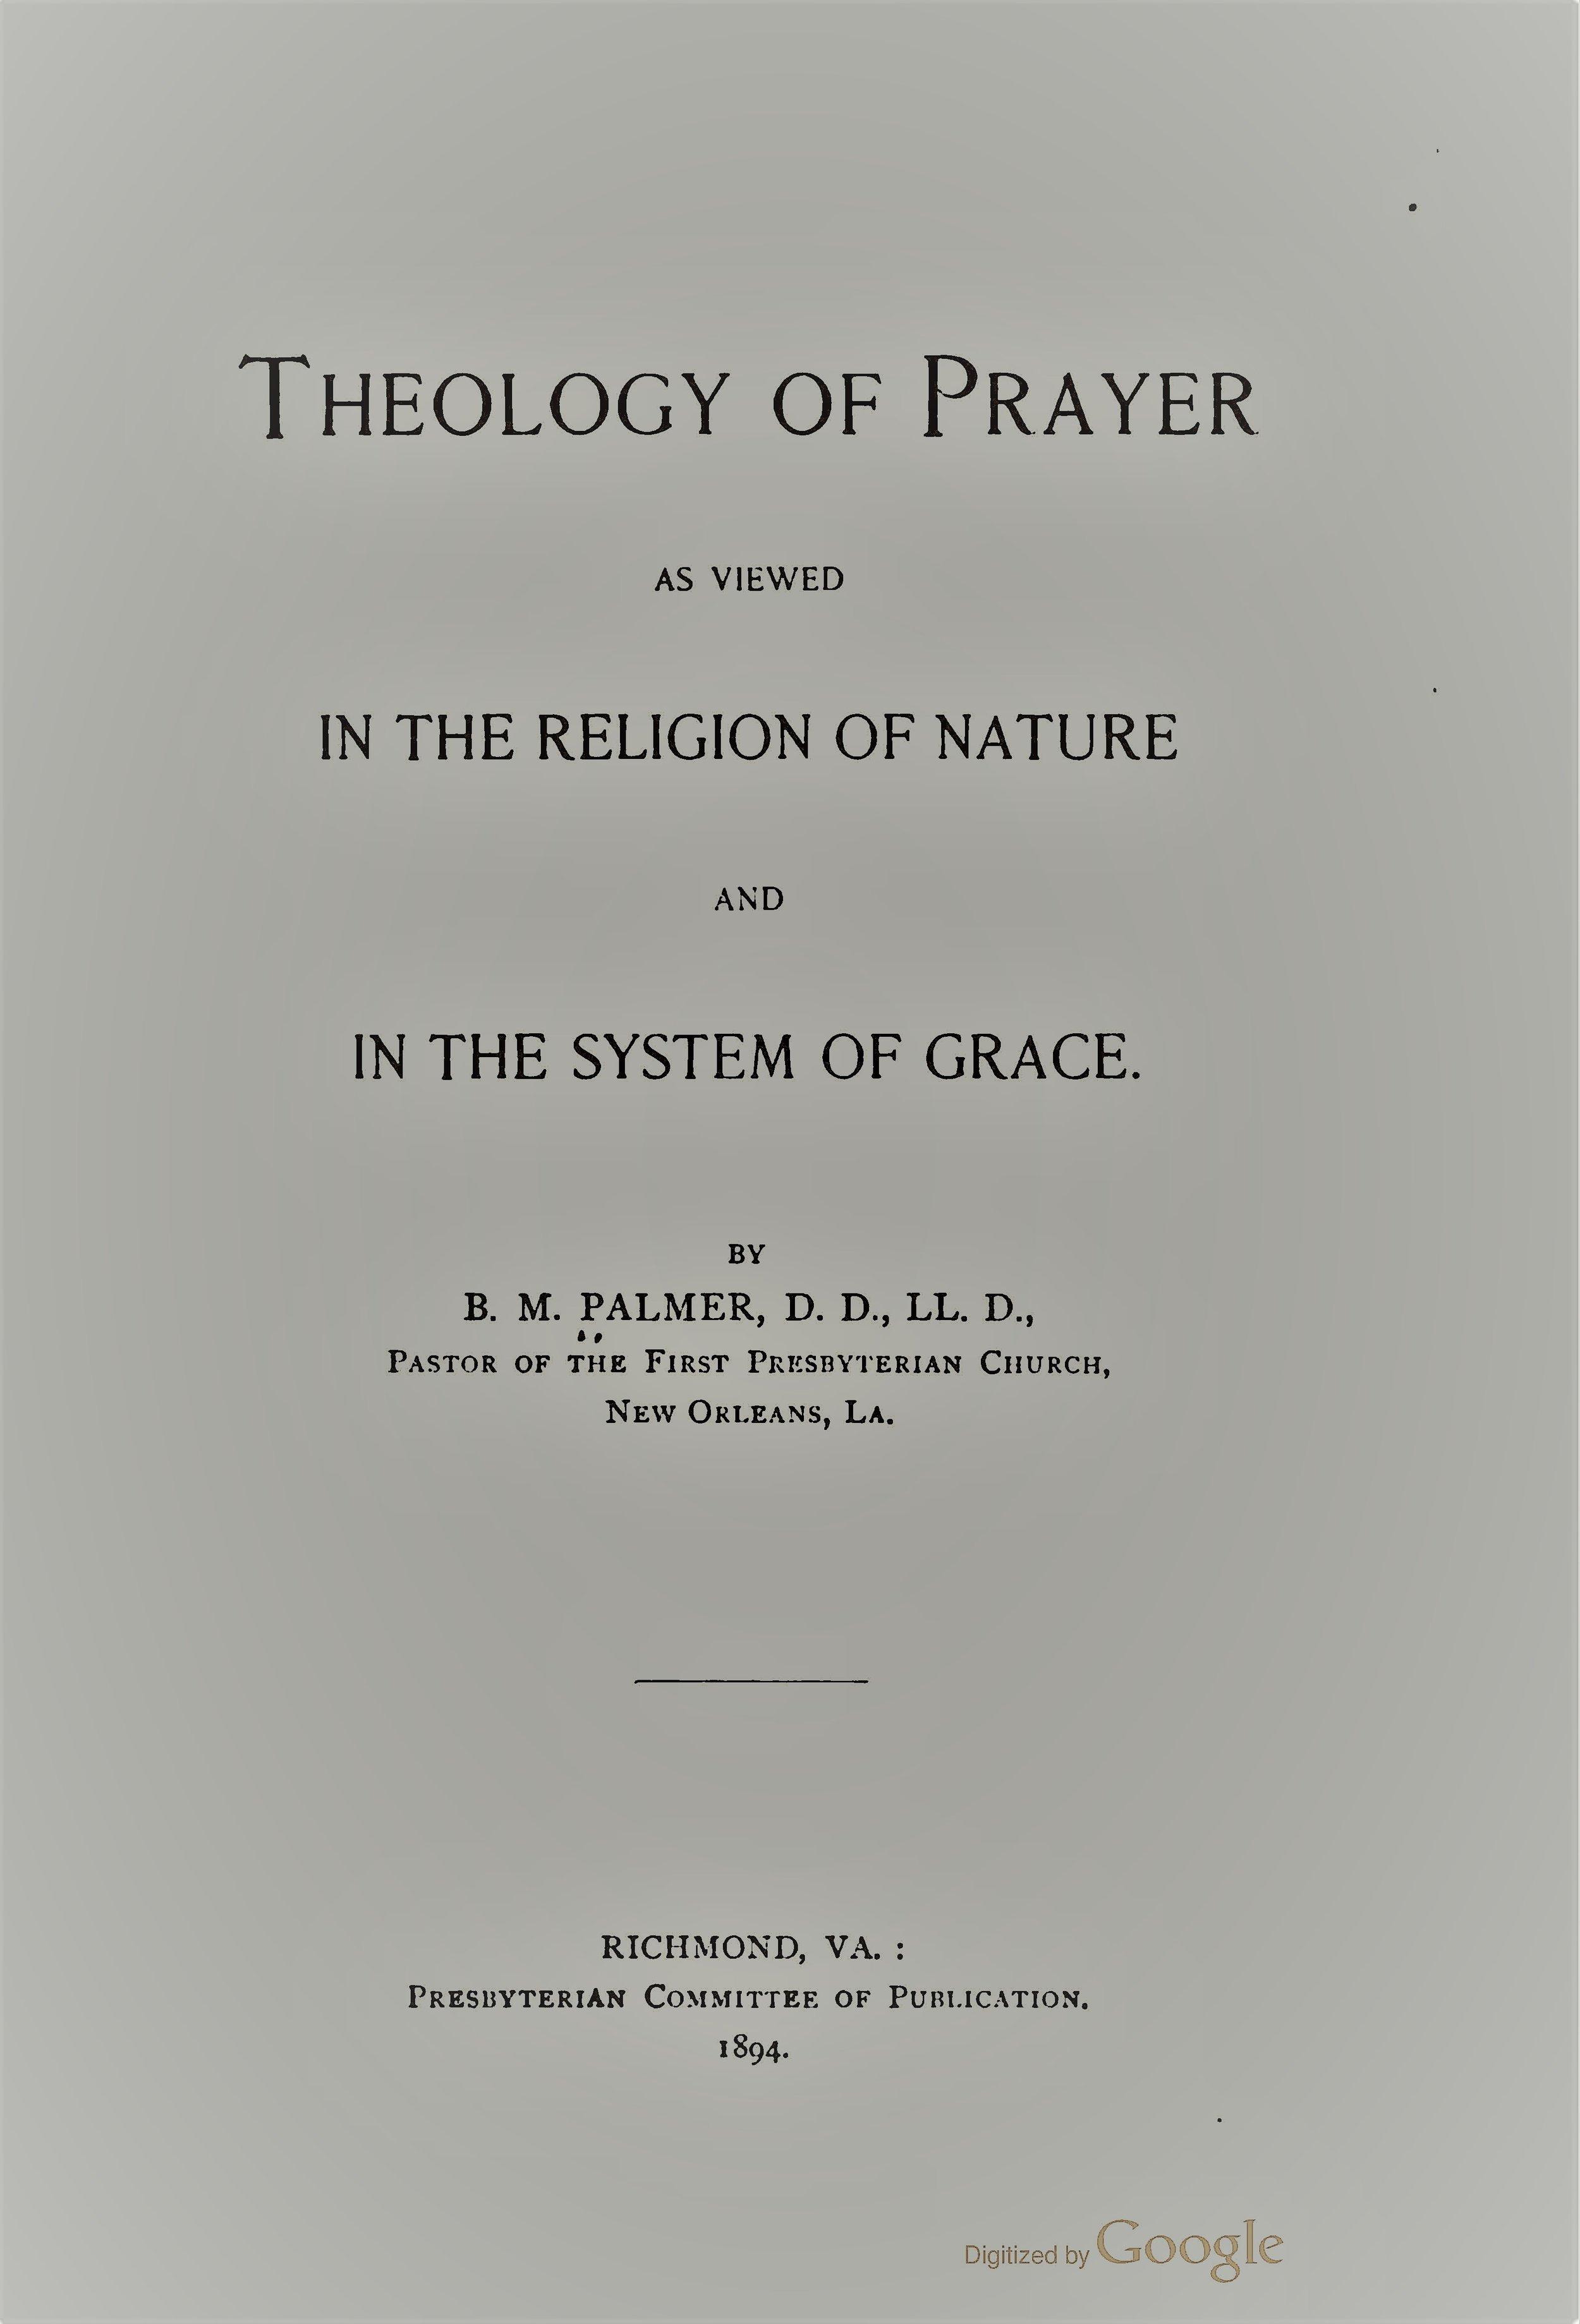 Palmer, Benjamin Morgan - Theology of Prayer.jpg